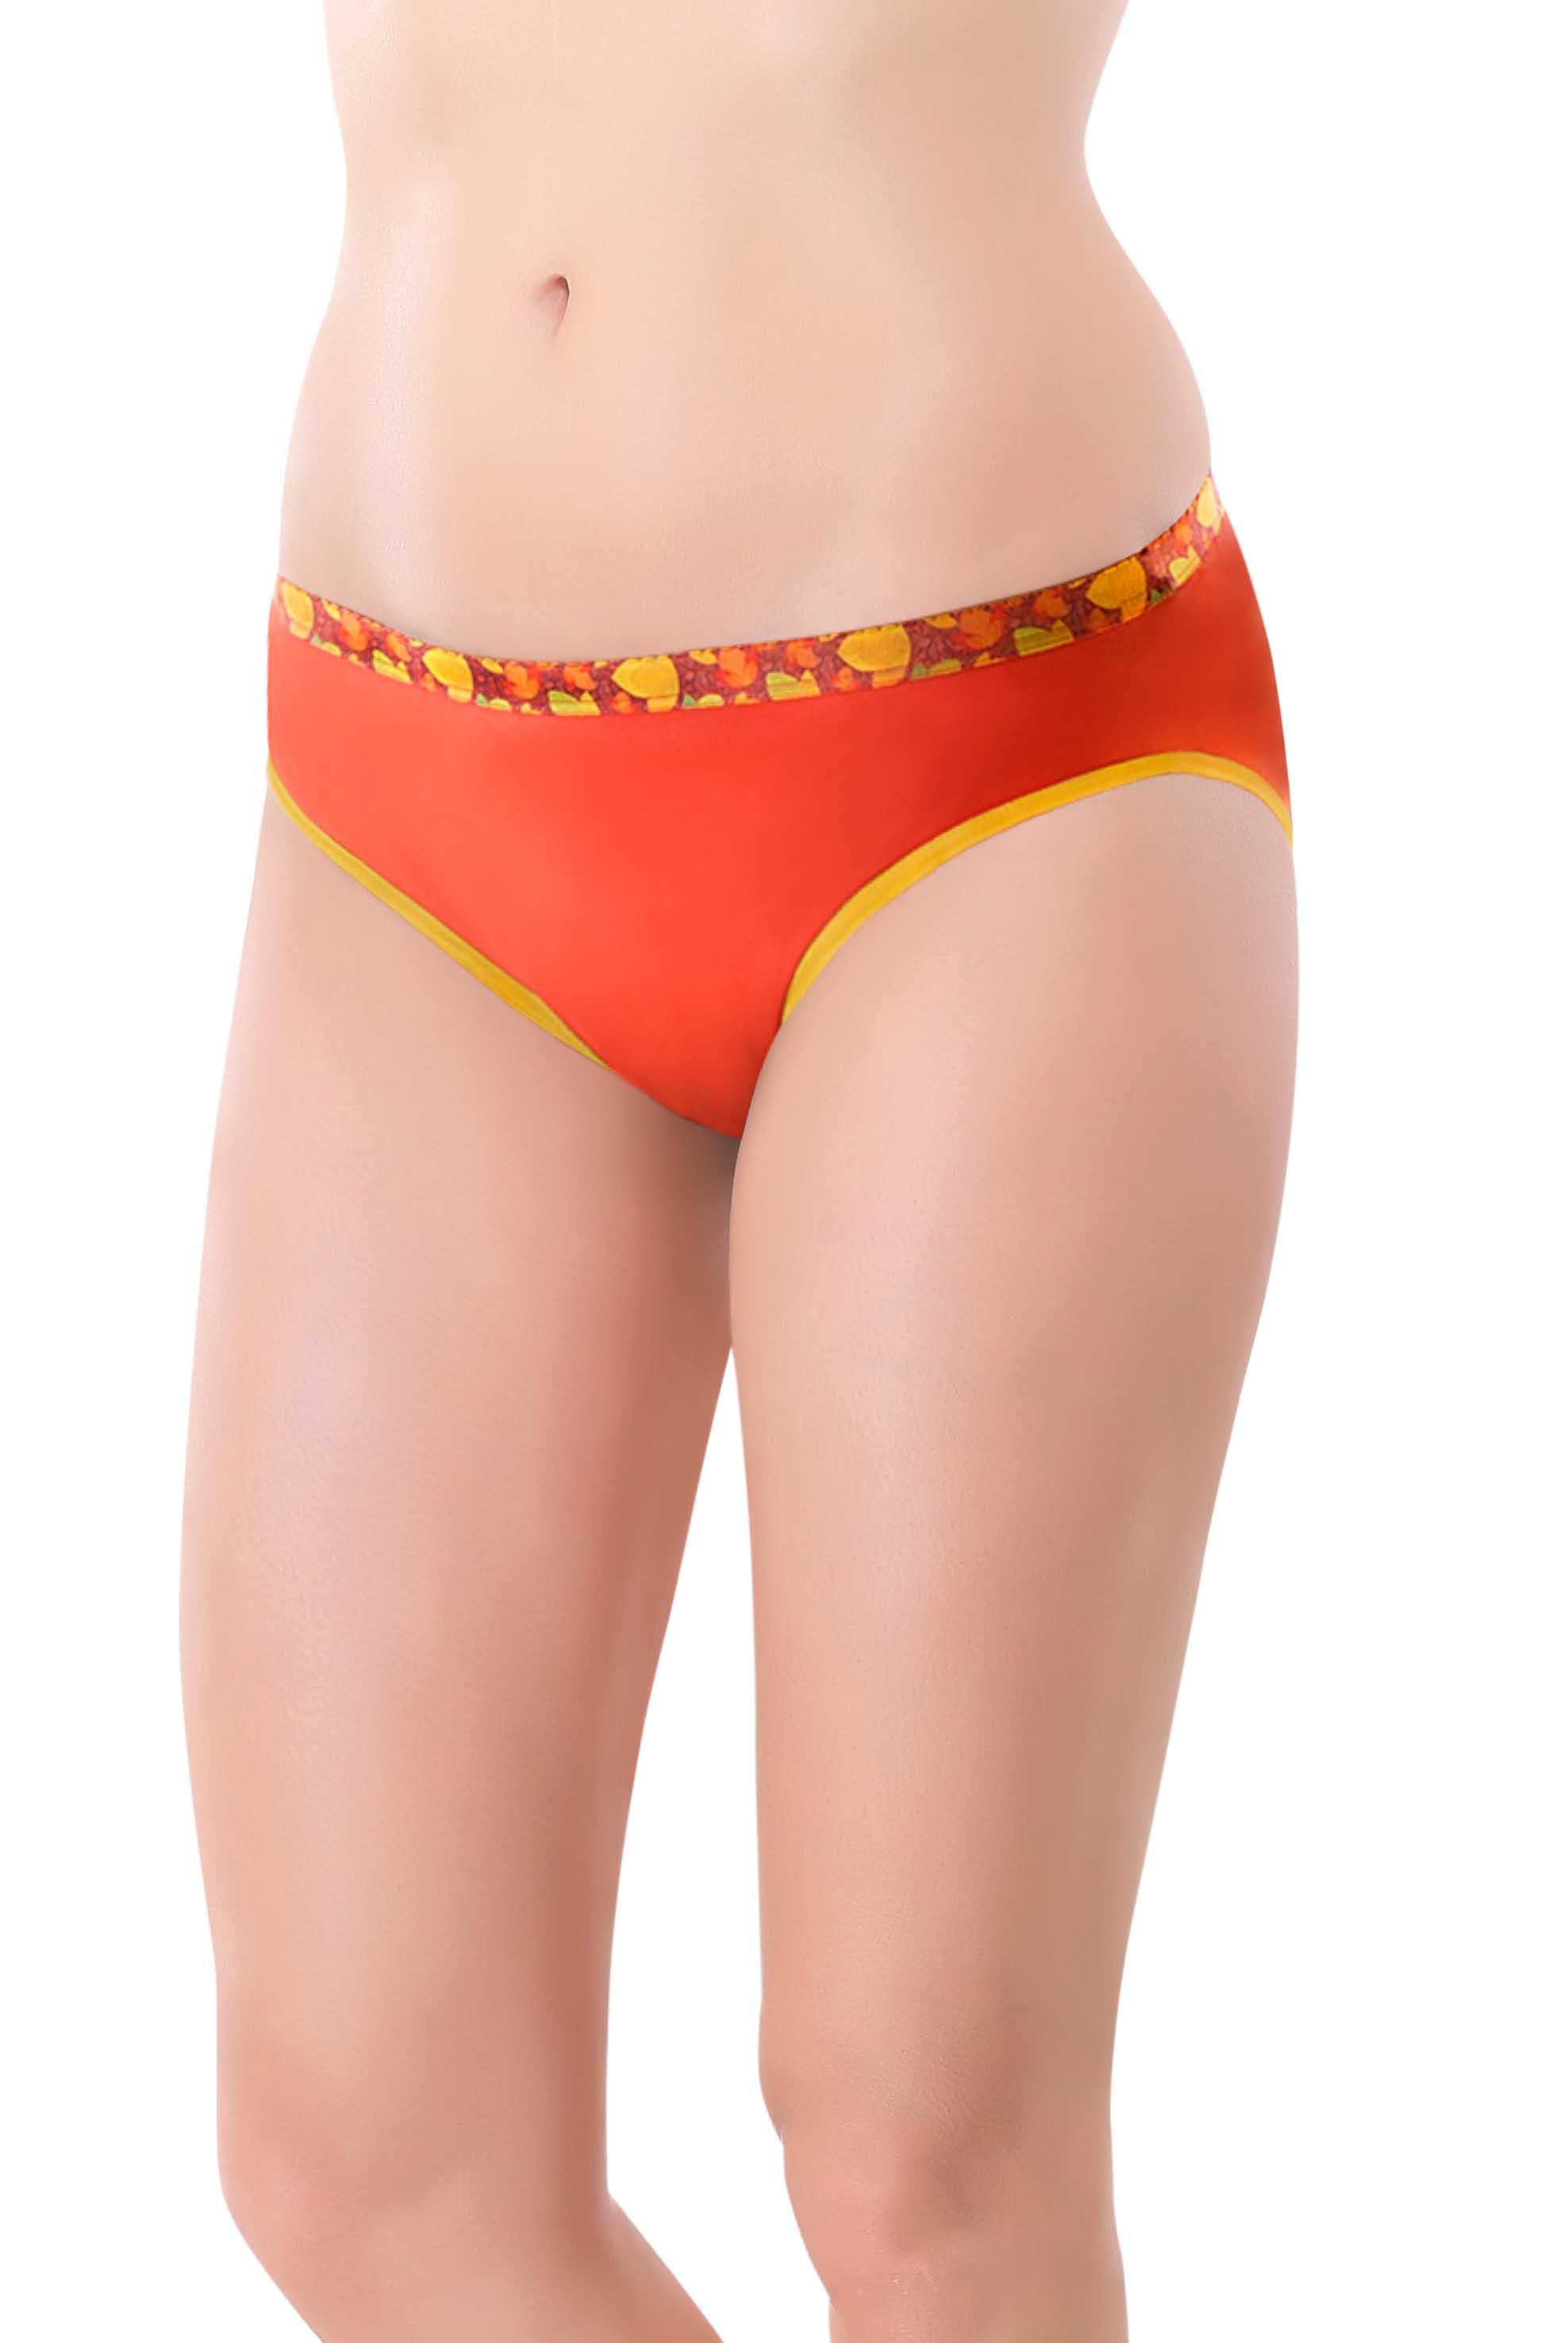 Orange Panties for women